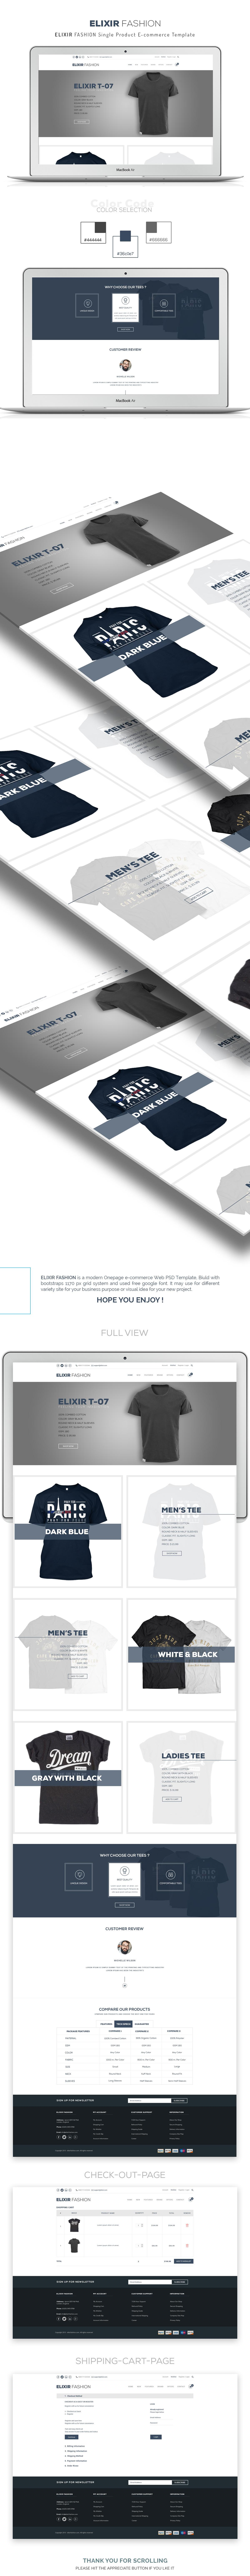 Elixir Single Product ECommerce Template On Behance - Single product ecommerce template